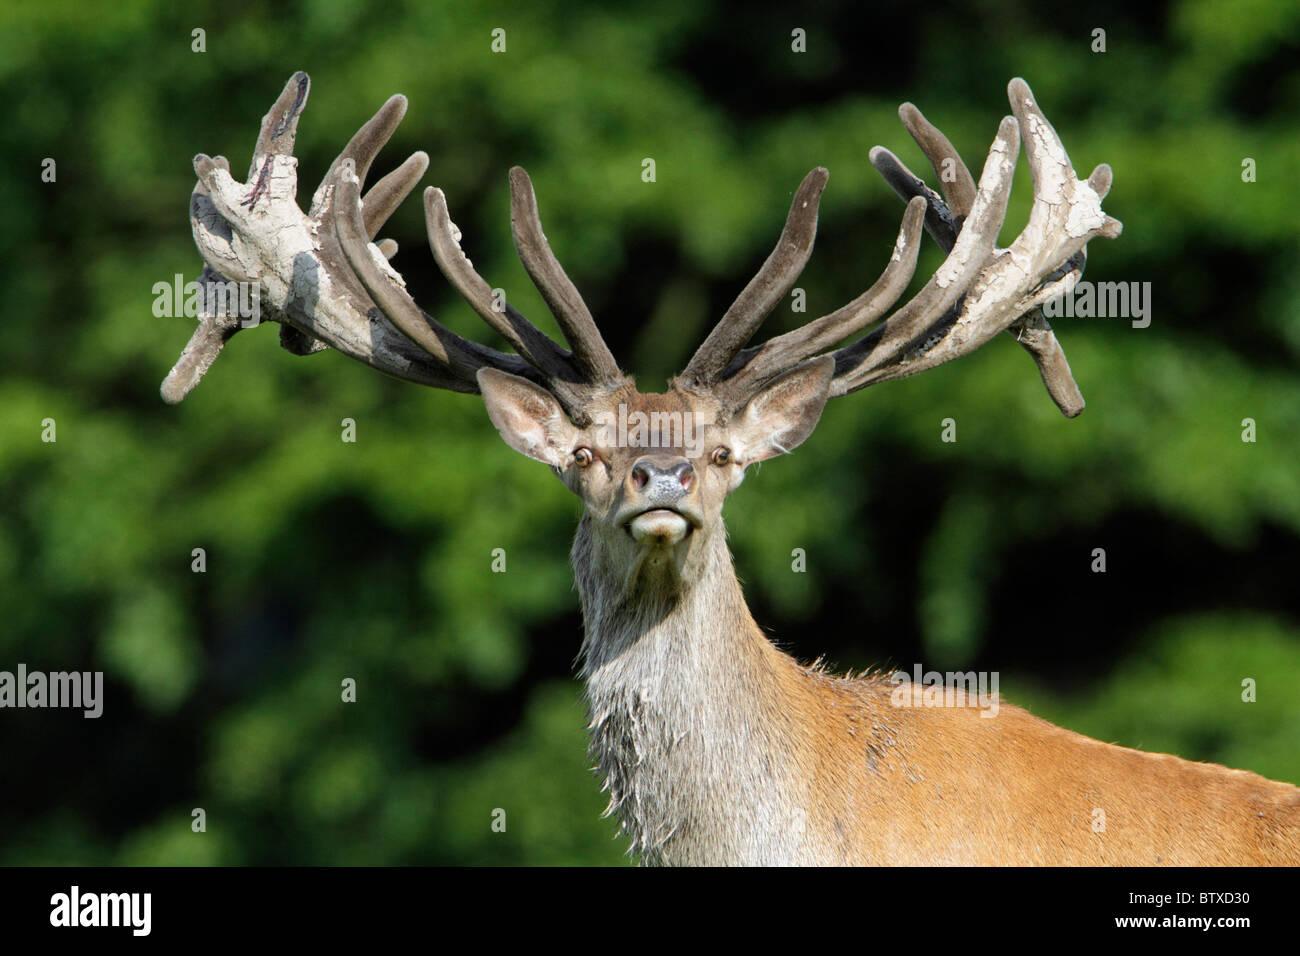 Red Deer (Cervus elaphus), stag with velvet on antlers, alert, Germany - Stock Image